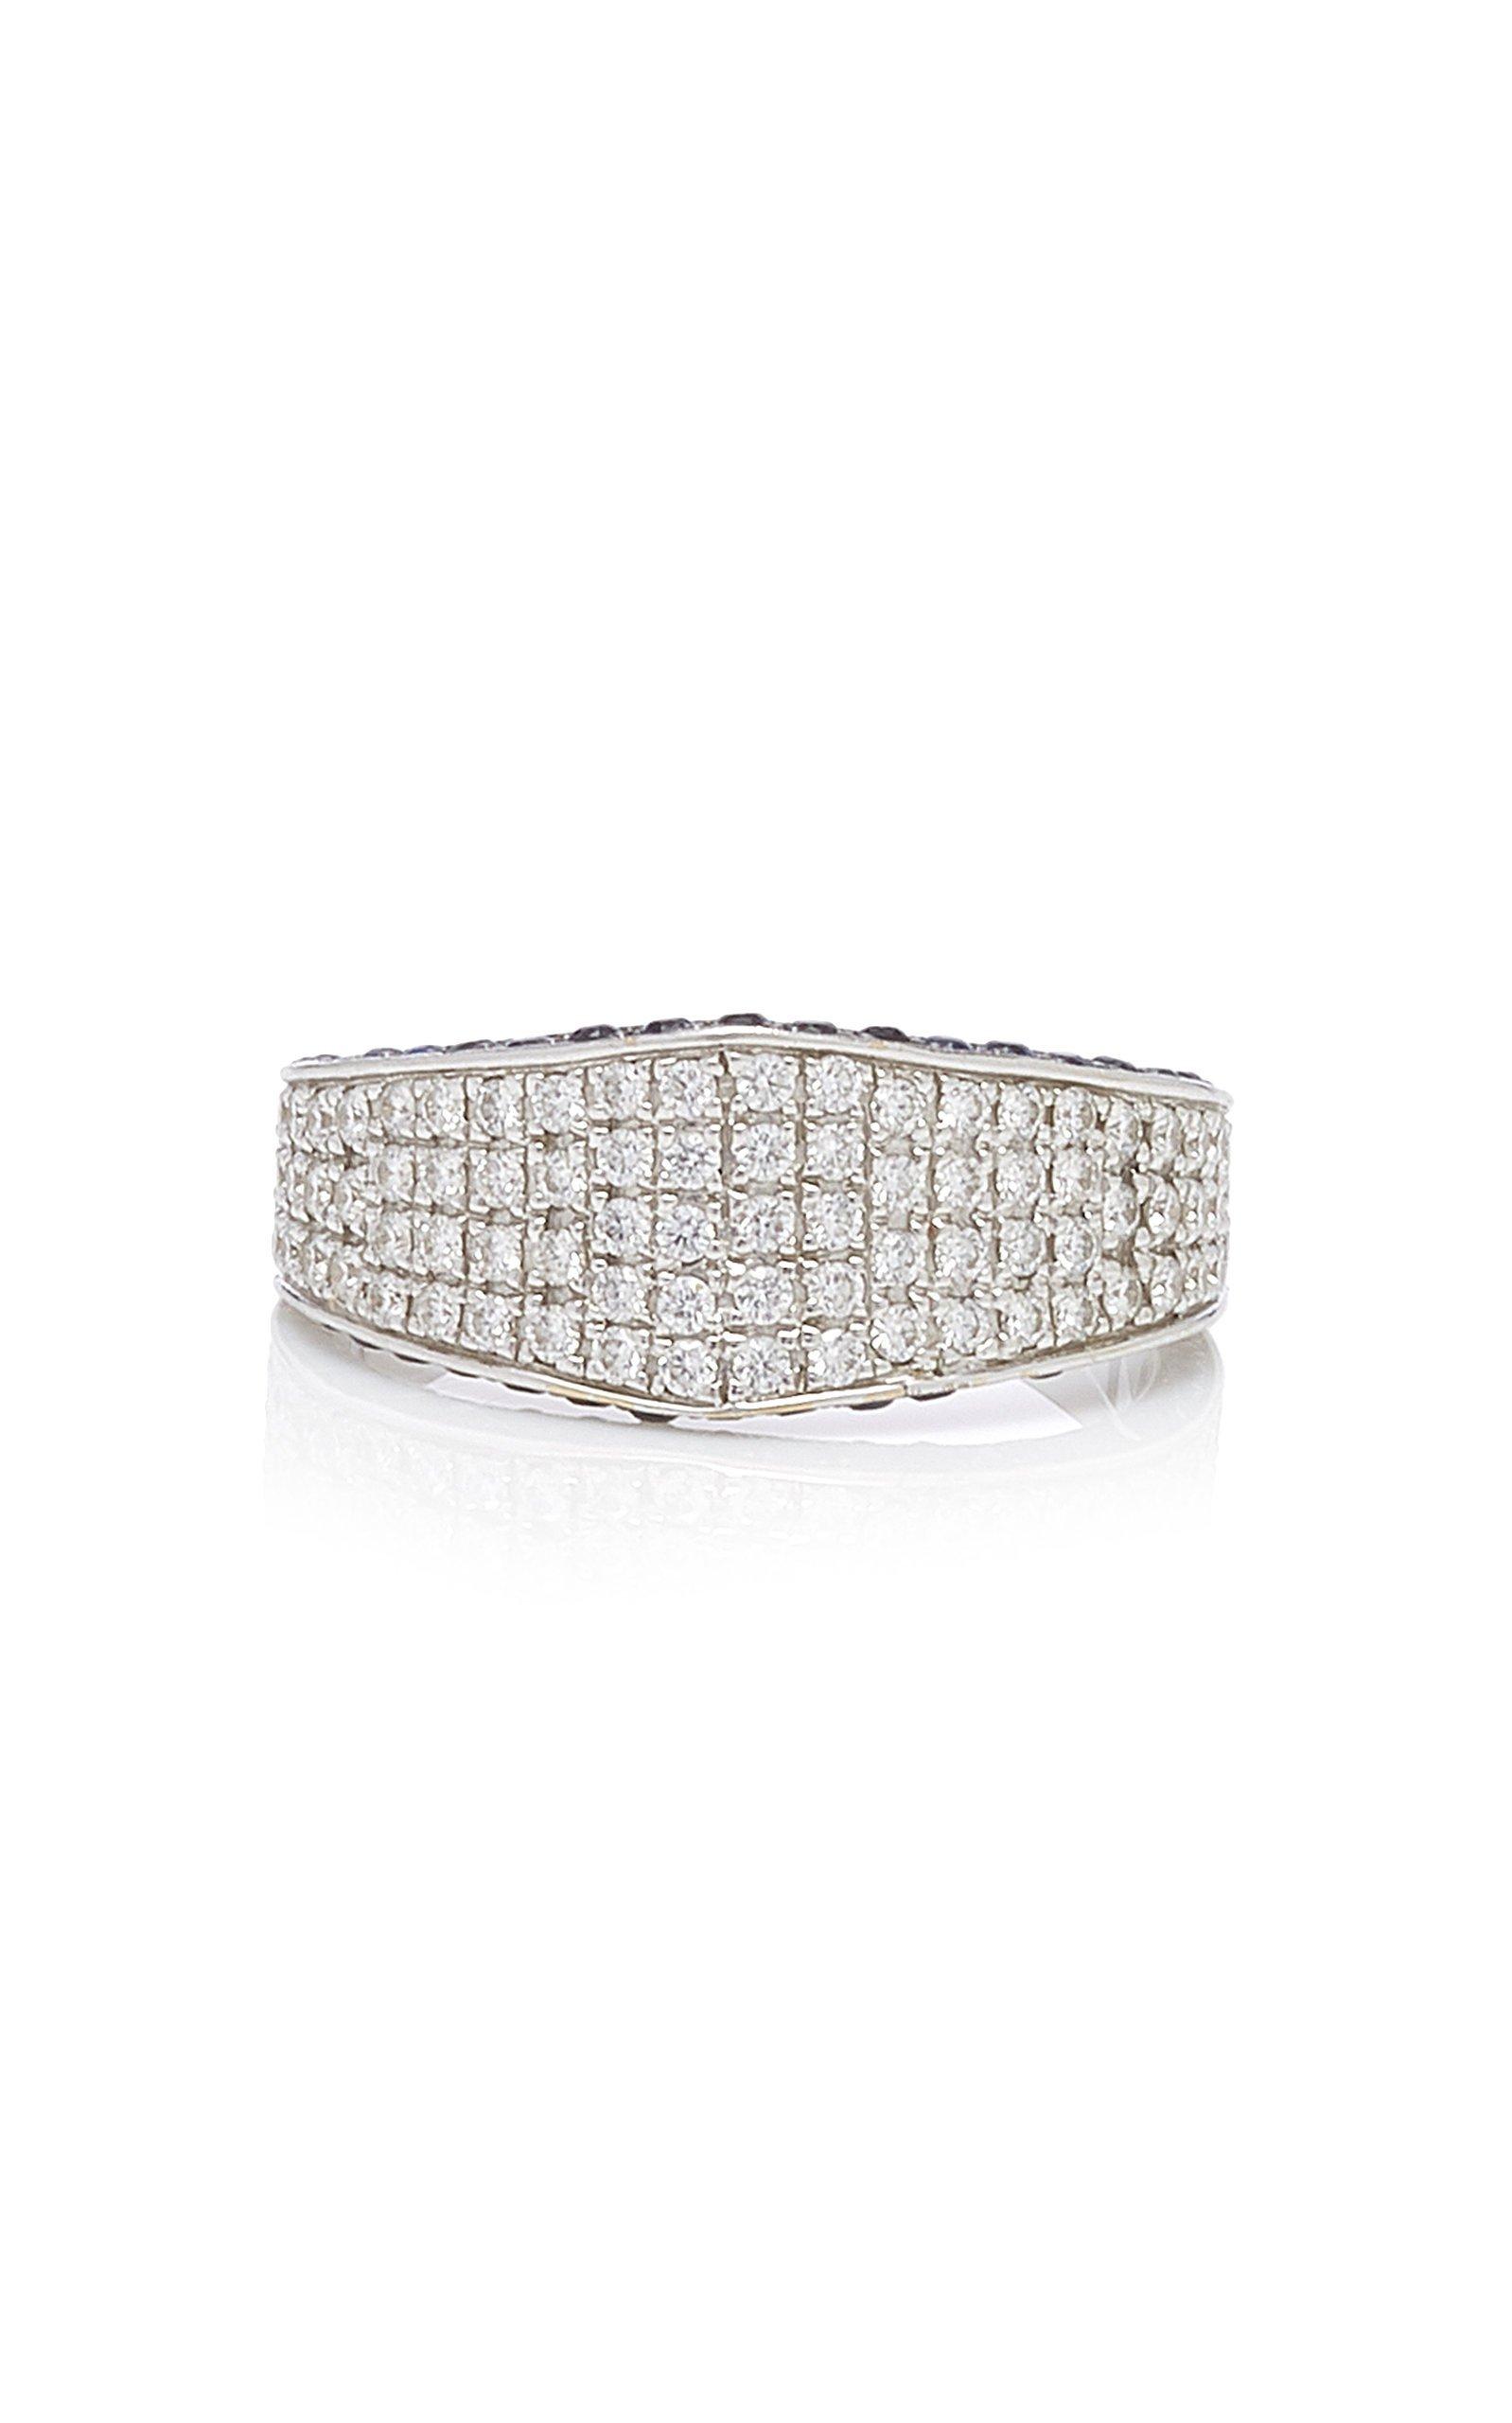 Ralph Masri Modernist Ring